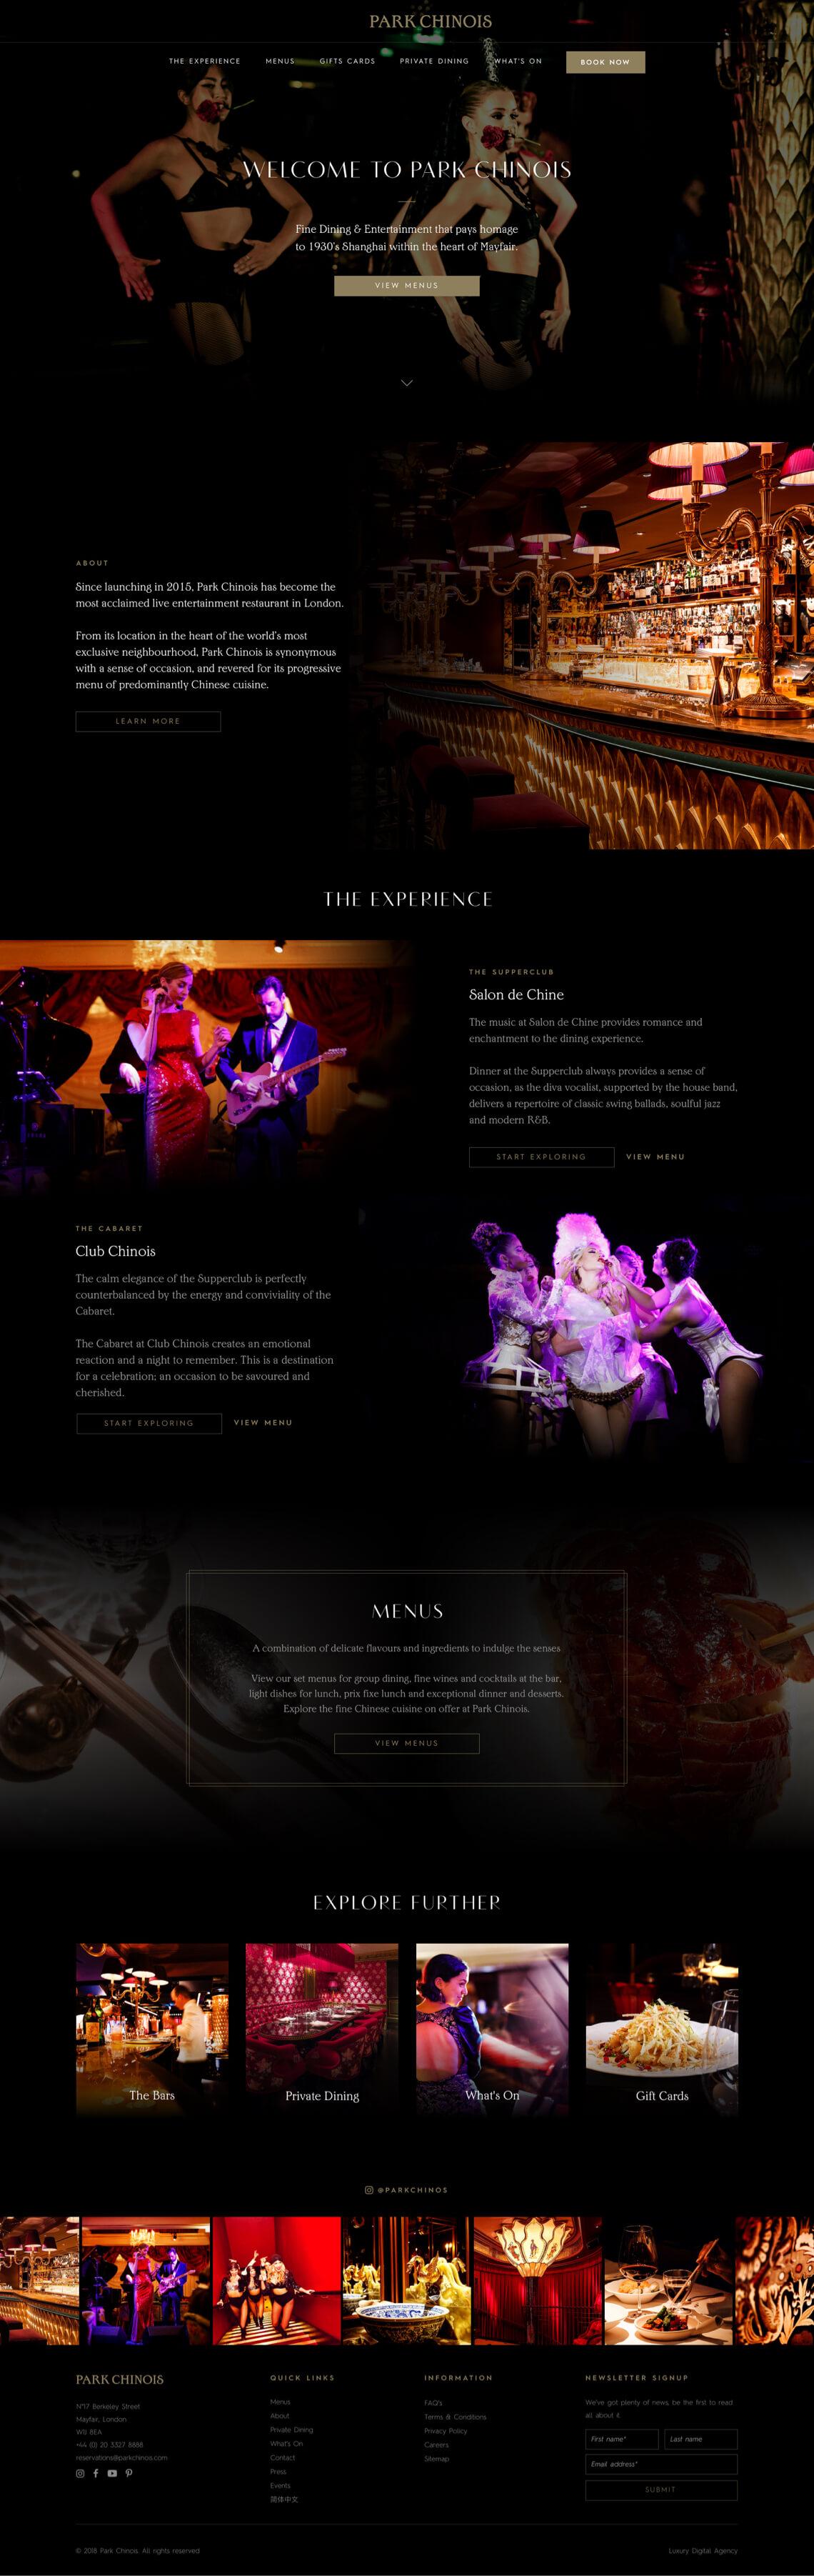 park chinois homepage